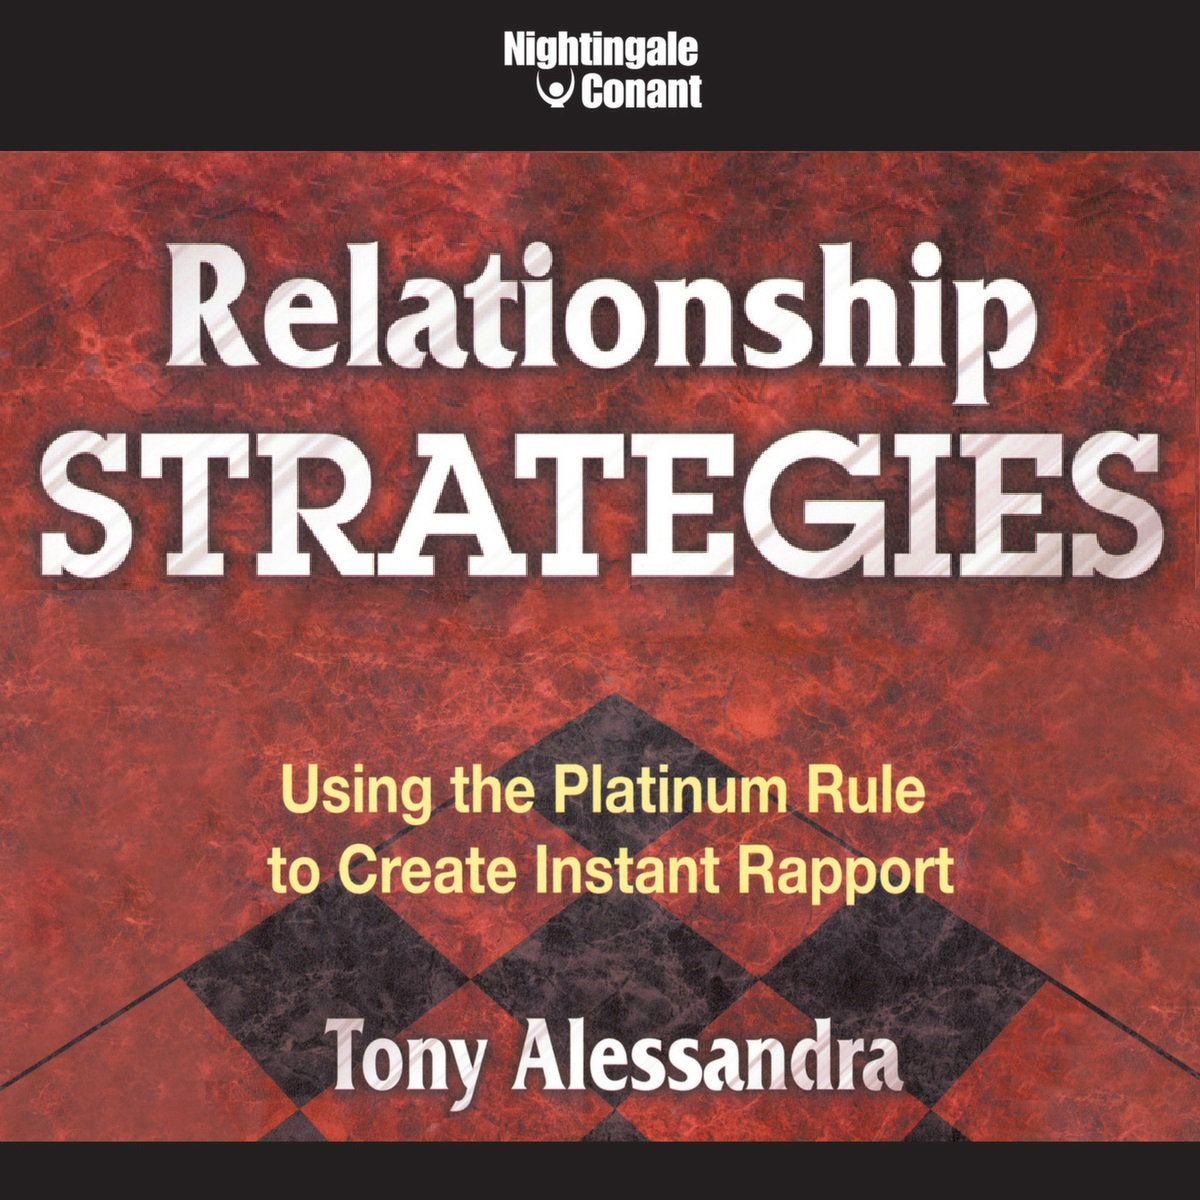 Relationship Strategies